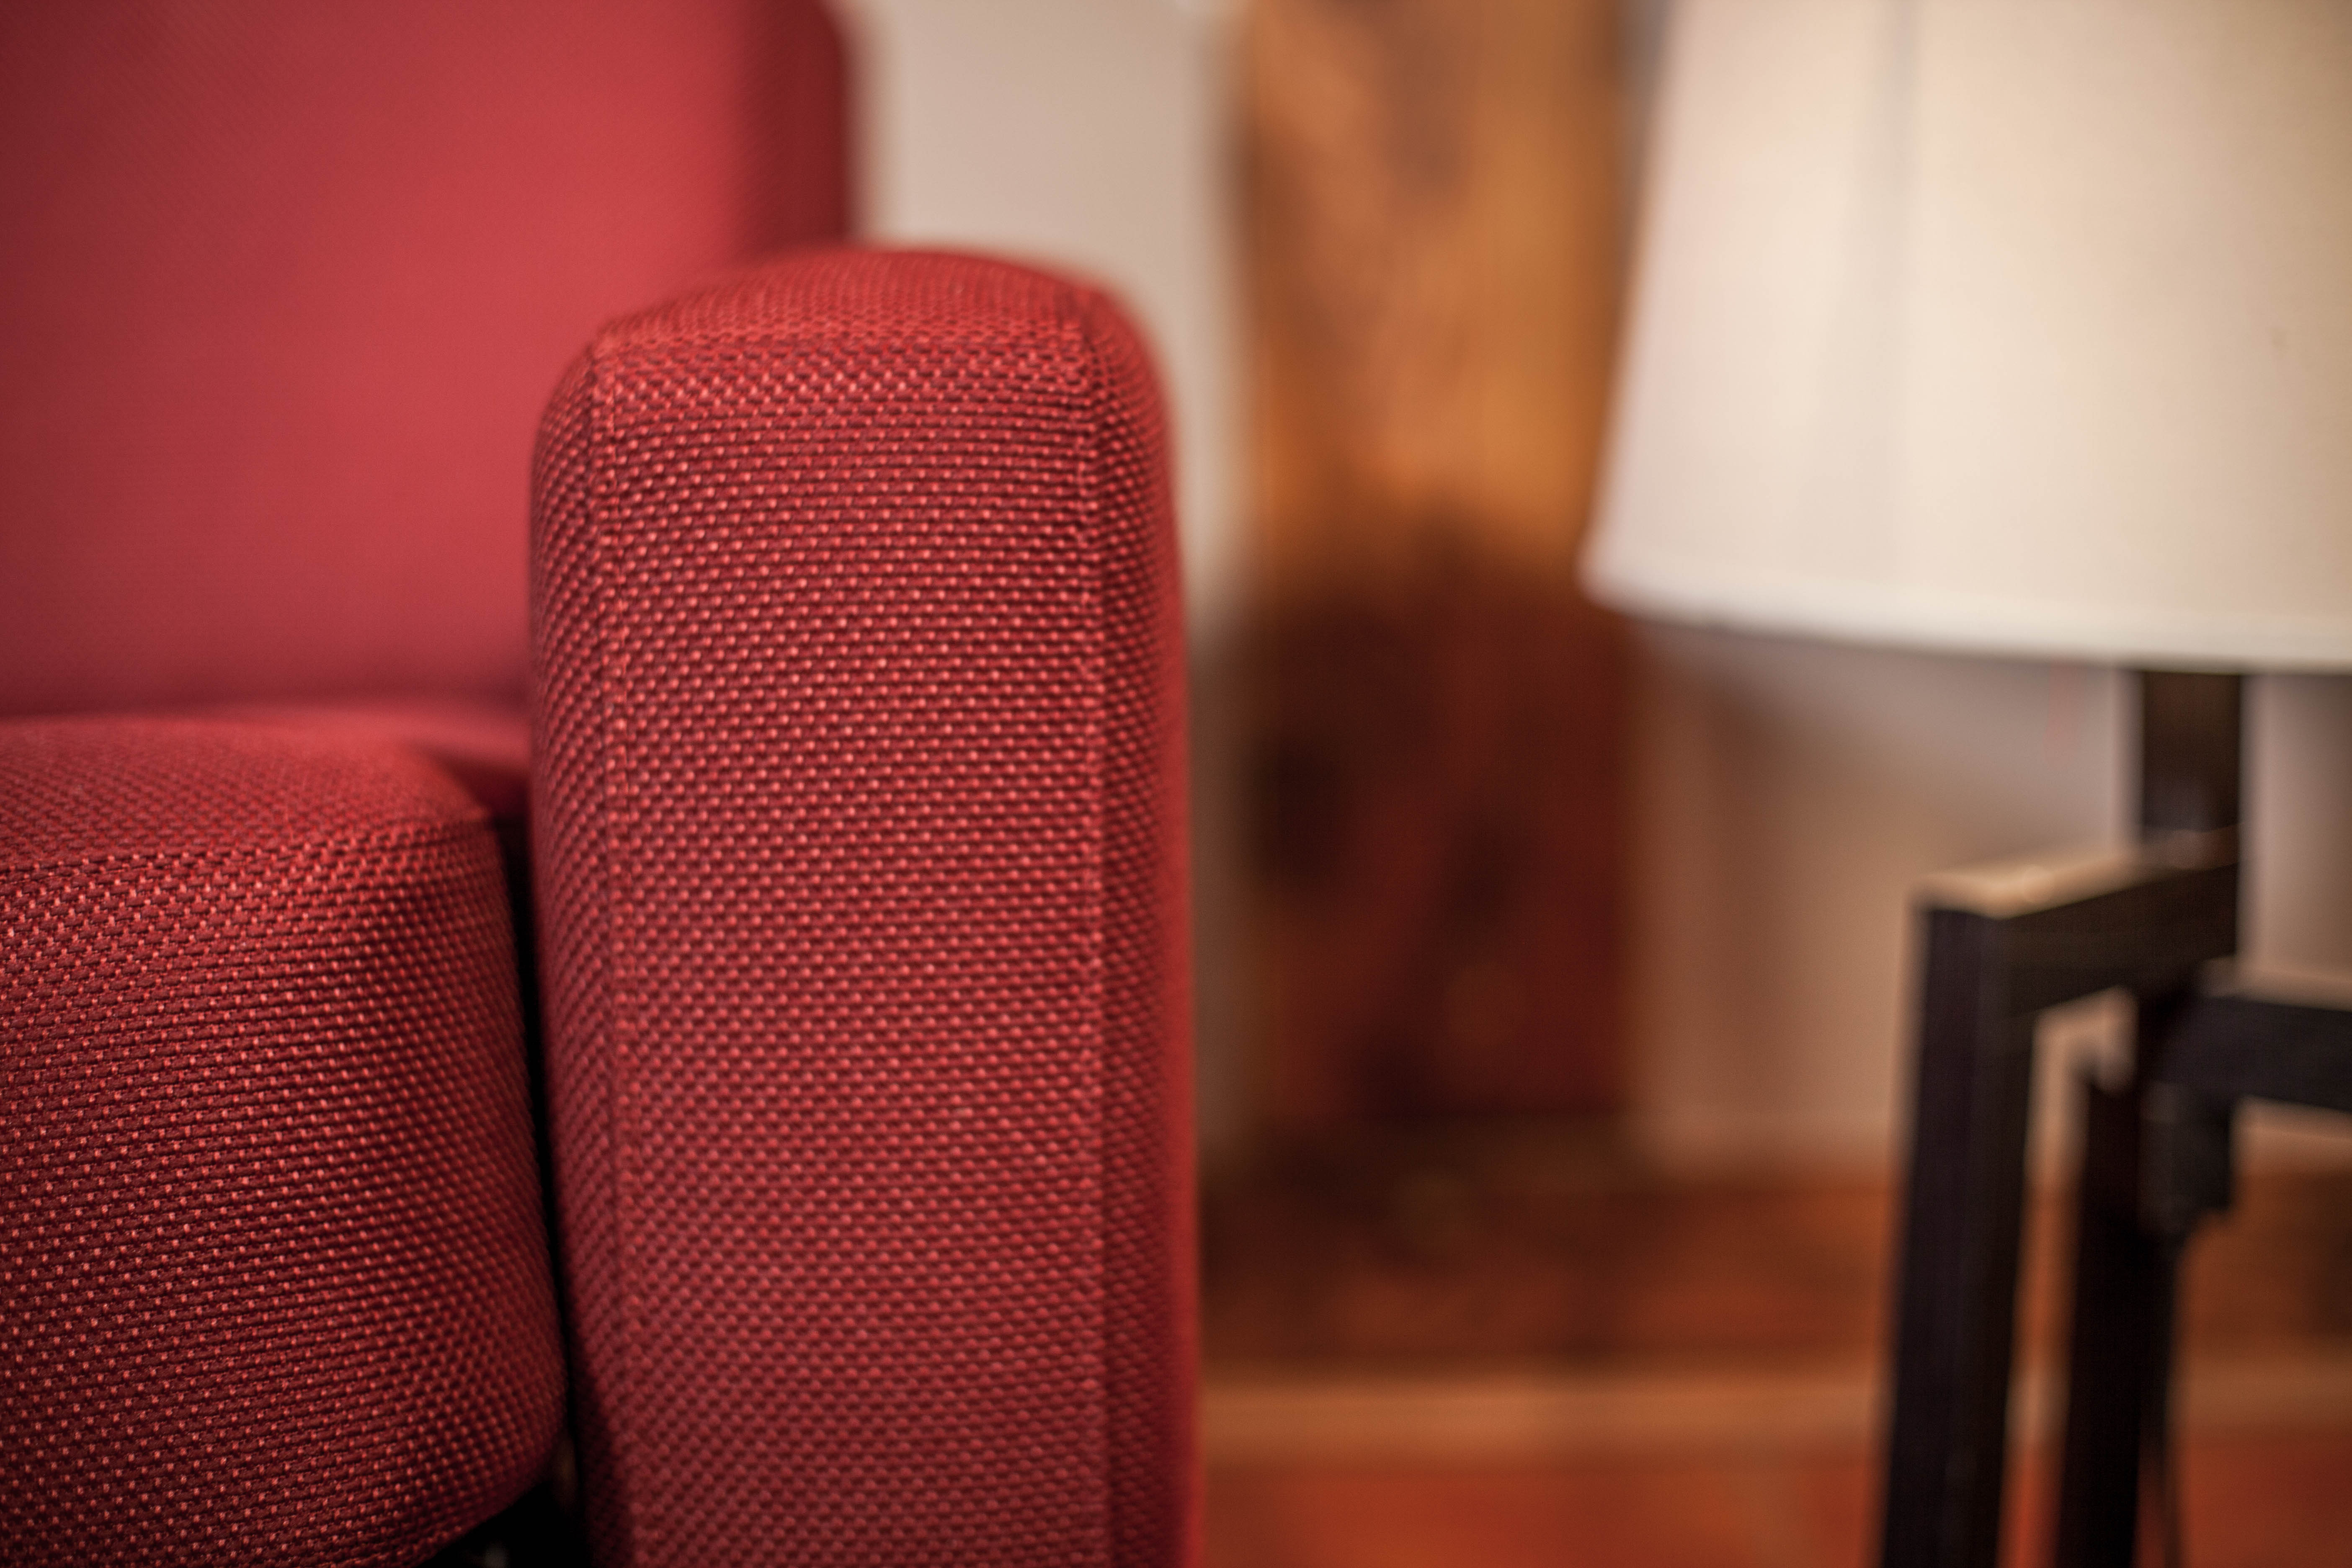 Rote Armlehne vom Hotel Schlafsofa